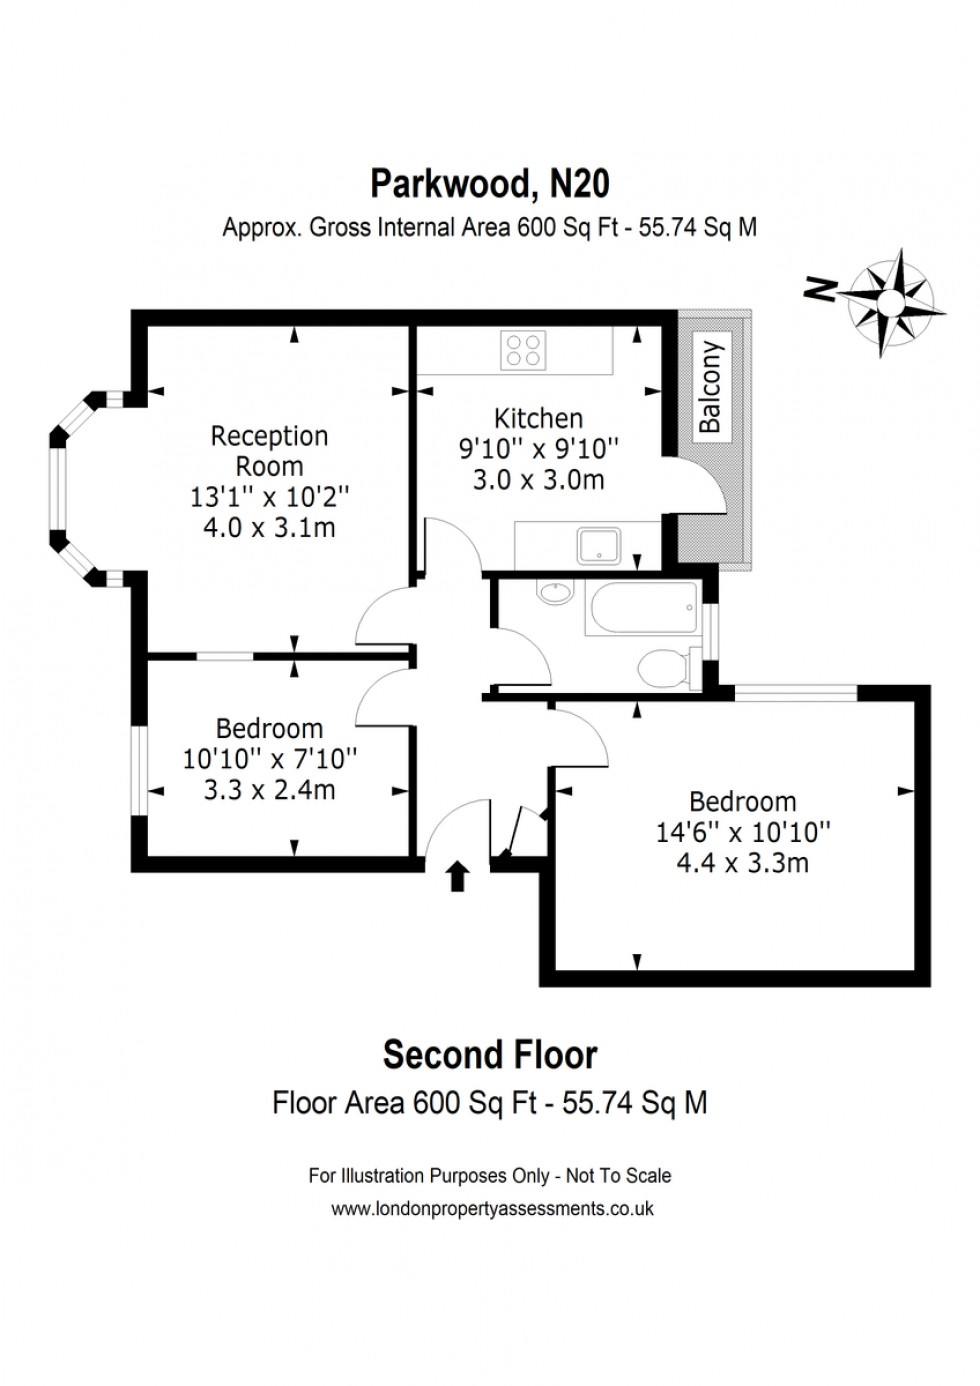 Floorplan for Parkwood, Friern Barnet, London